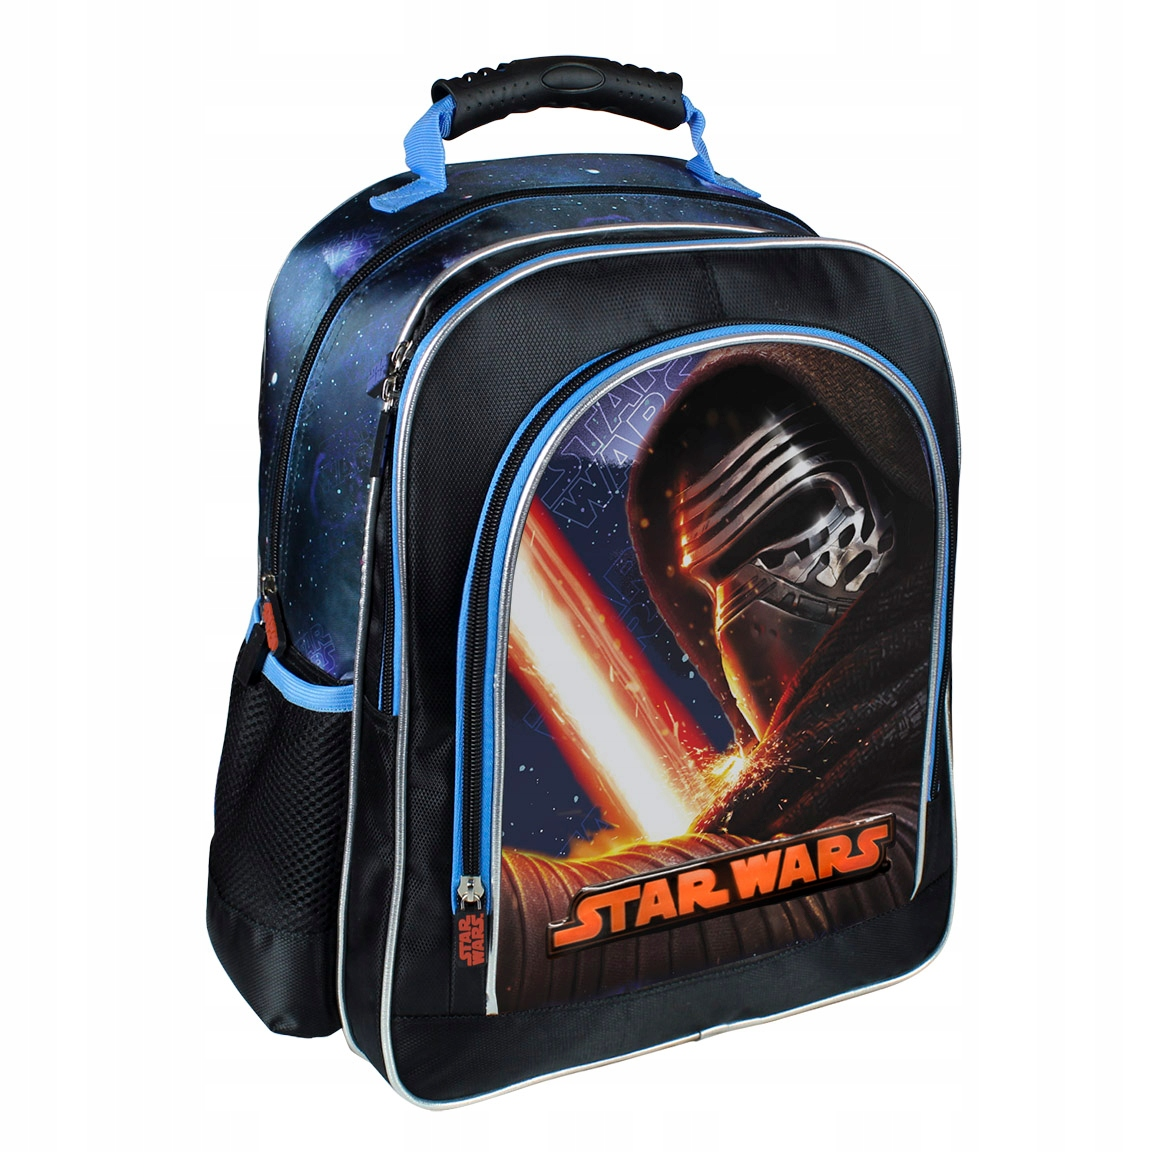 98cc7bcc84f0f Sklep Plecak Star Wars! - 7358817957 - oficjalne archiwum allegro